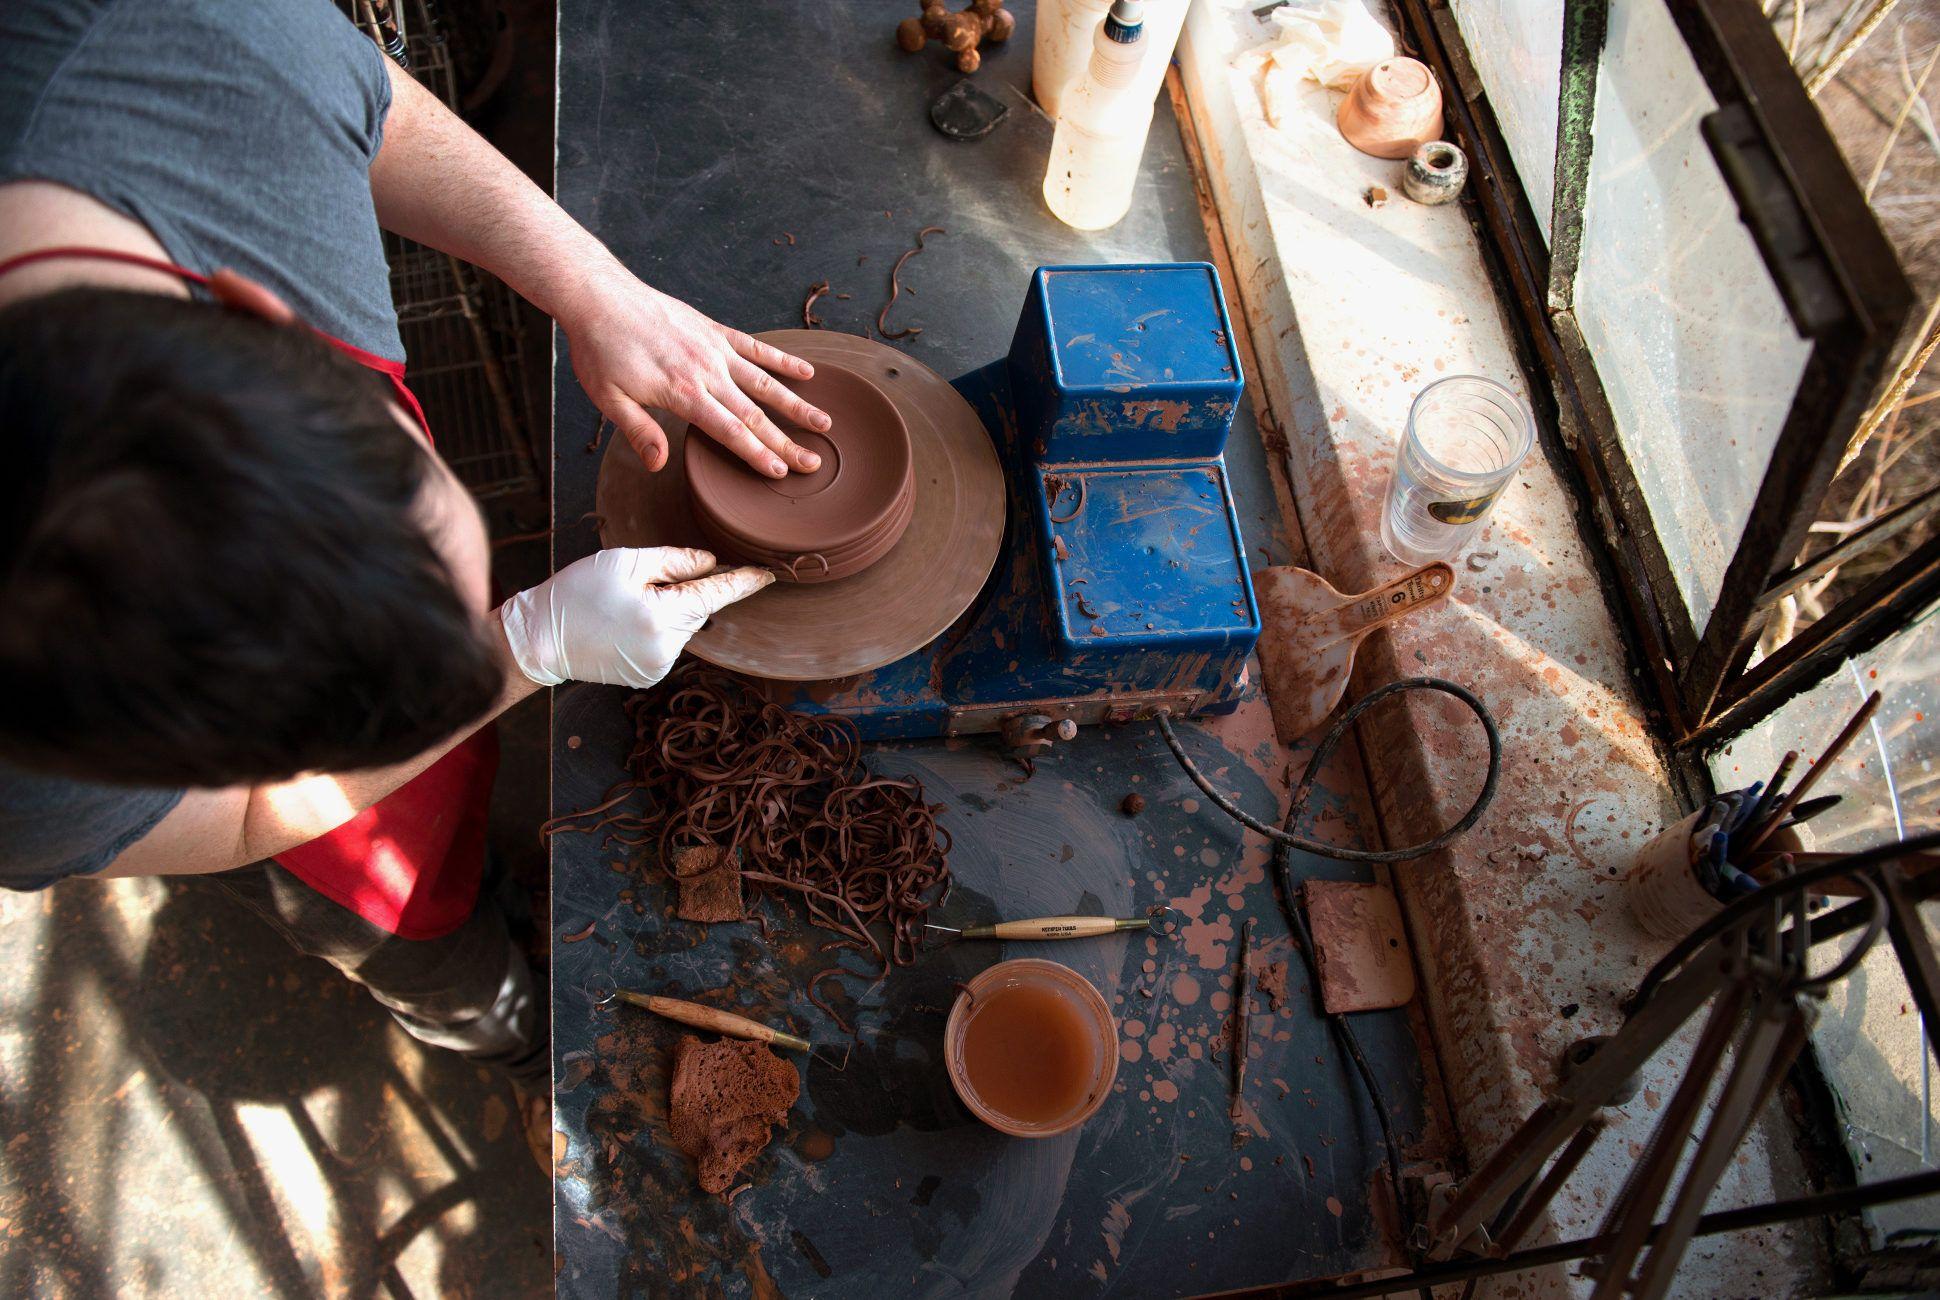 Jono-Pandolfi-pottery-gear-patrol-970-retina-4